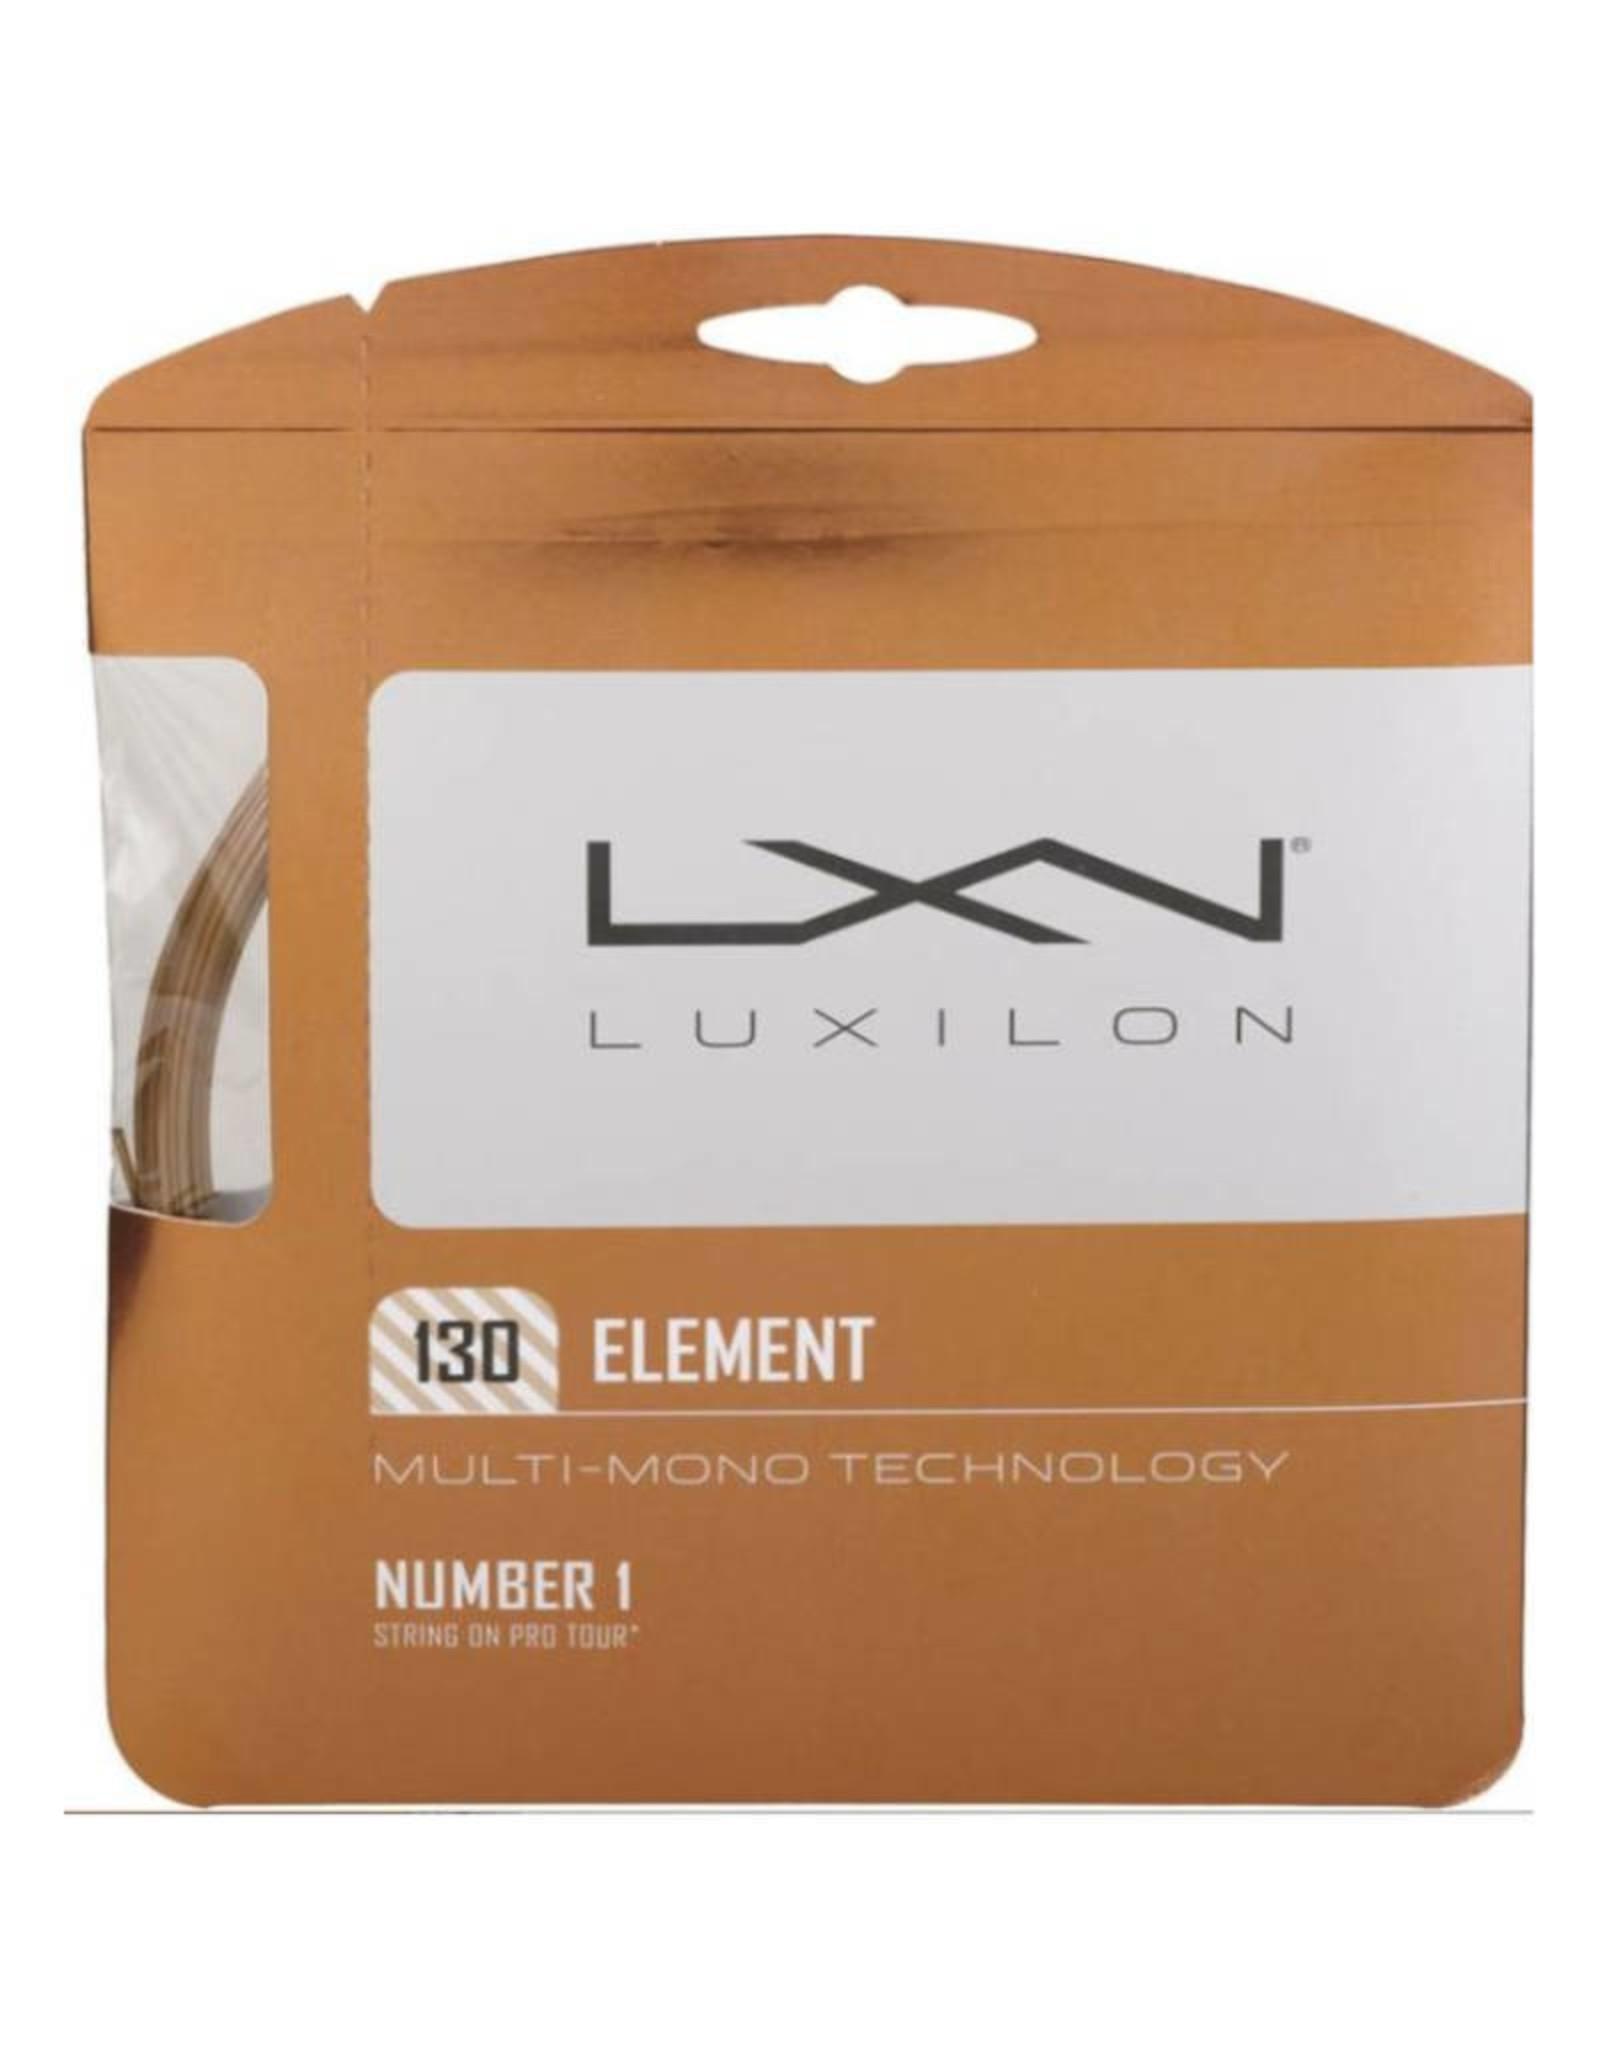 LUXILON ELEMENT 130 FULL SET